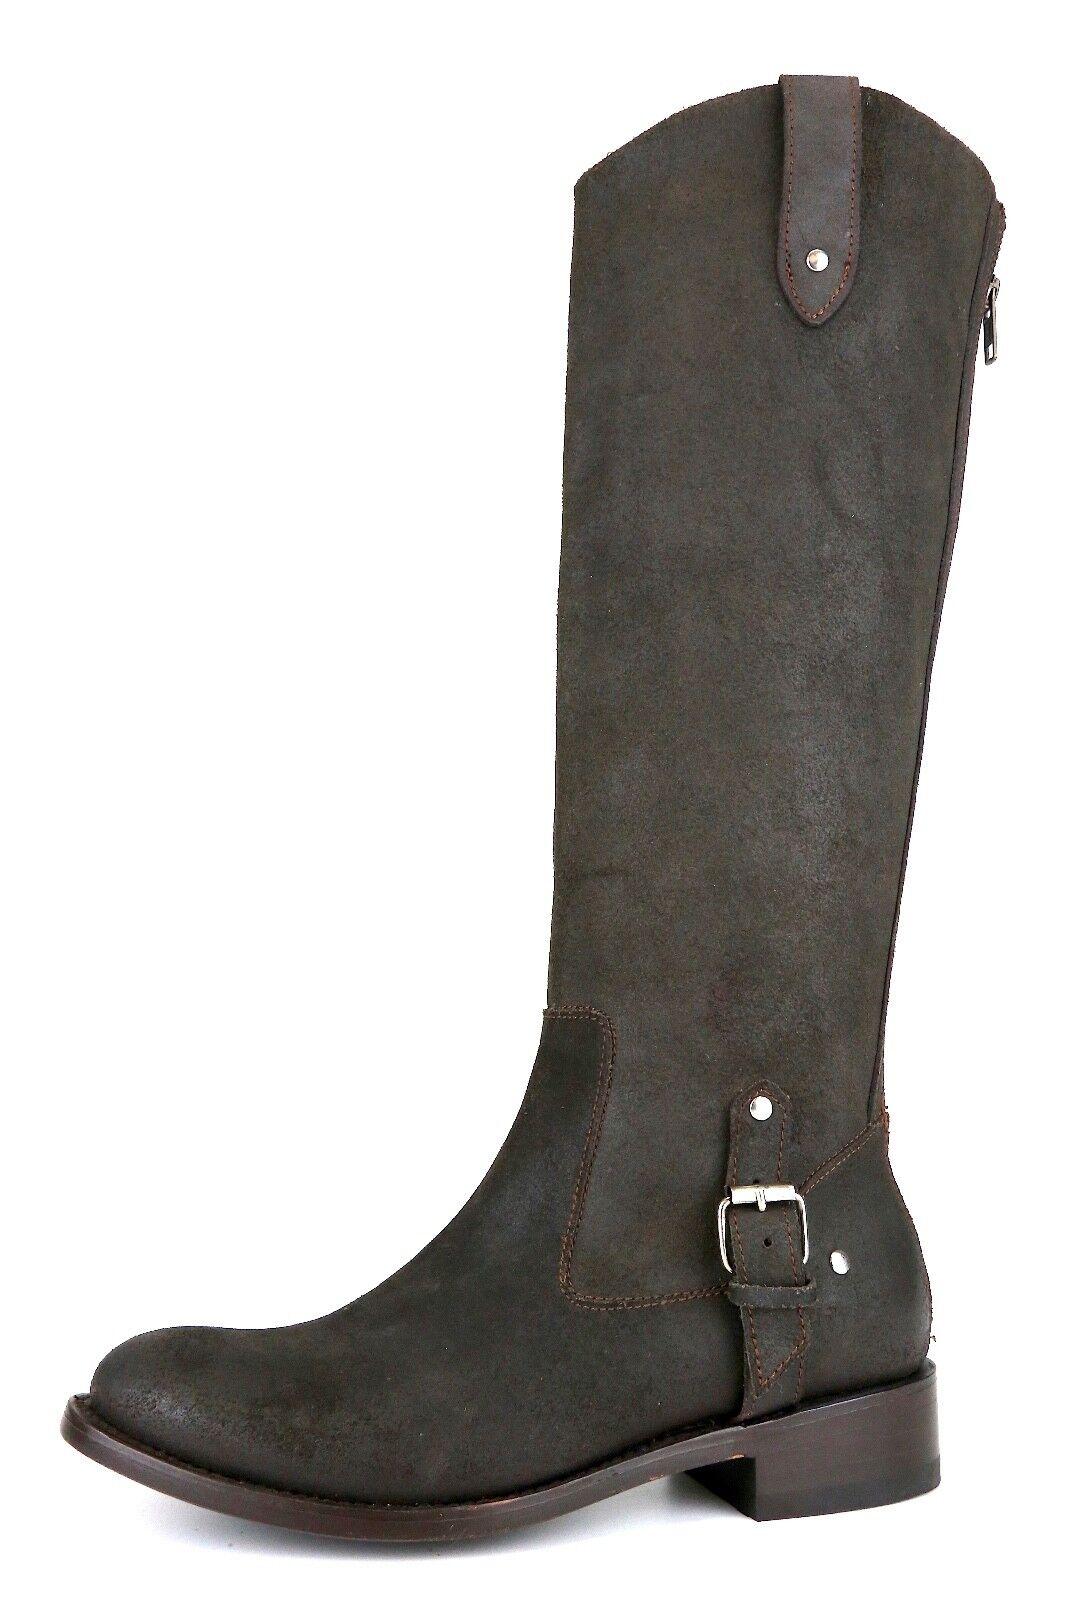 Dolce Vita Back Zip Suede Boots Brown Women Sz 6.5 5057 *